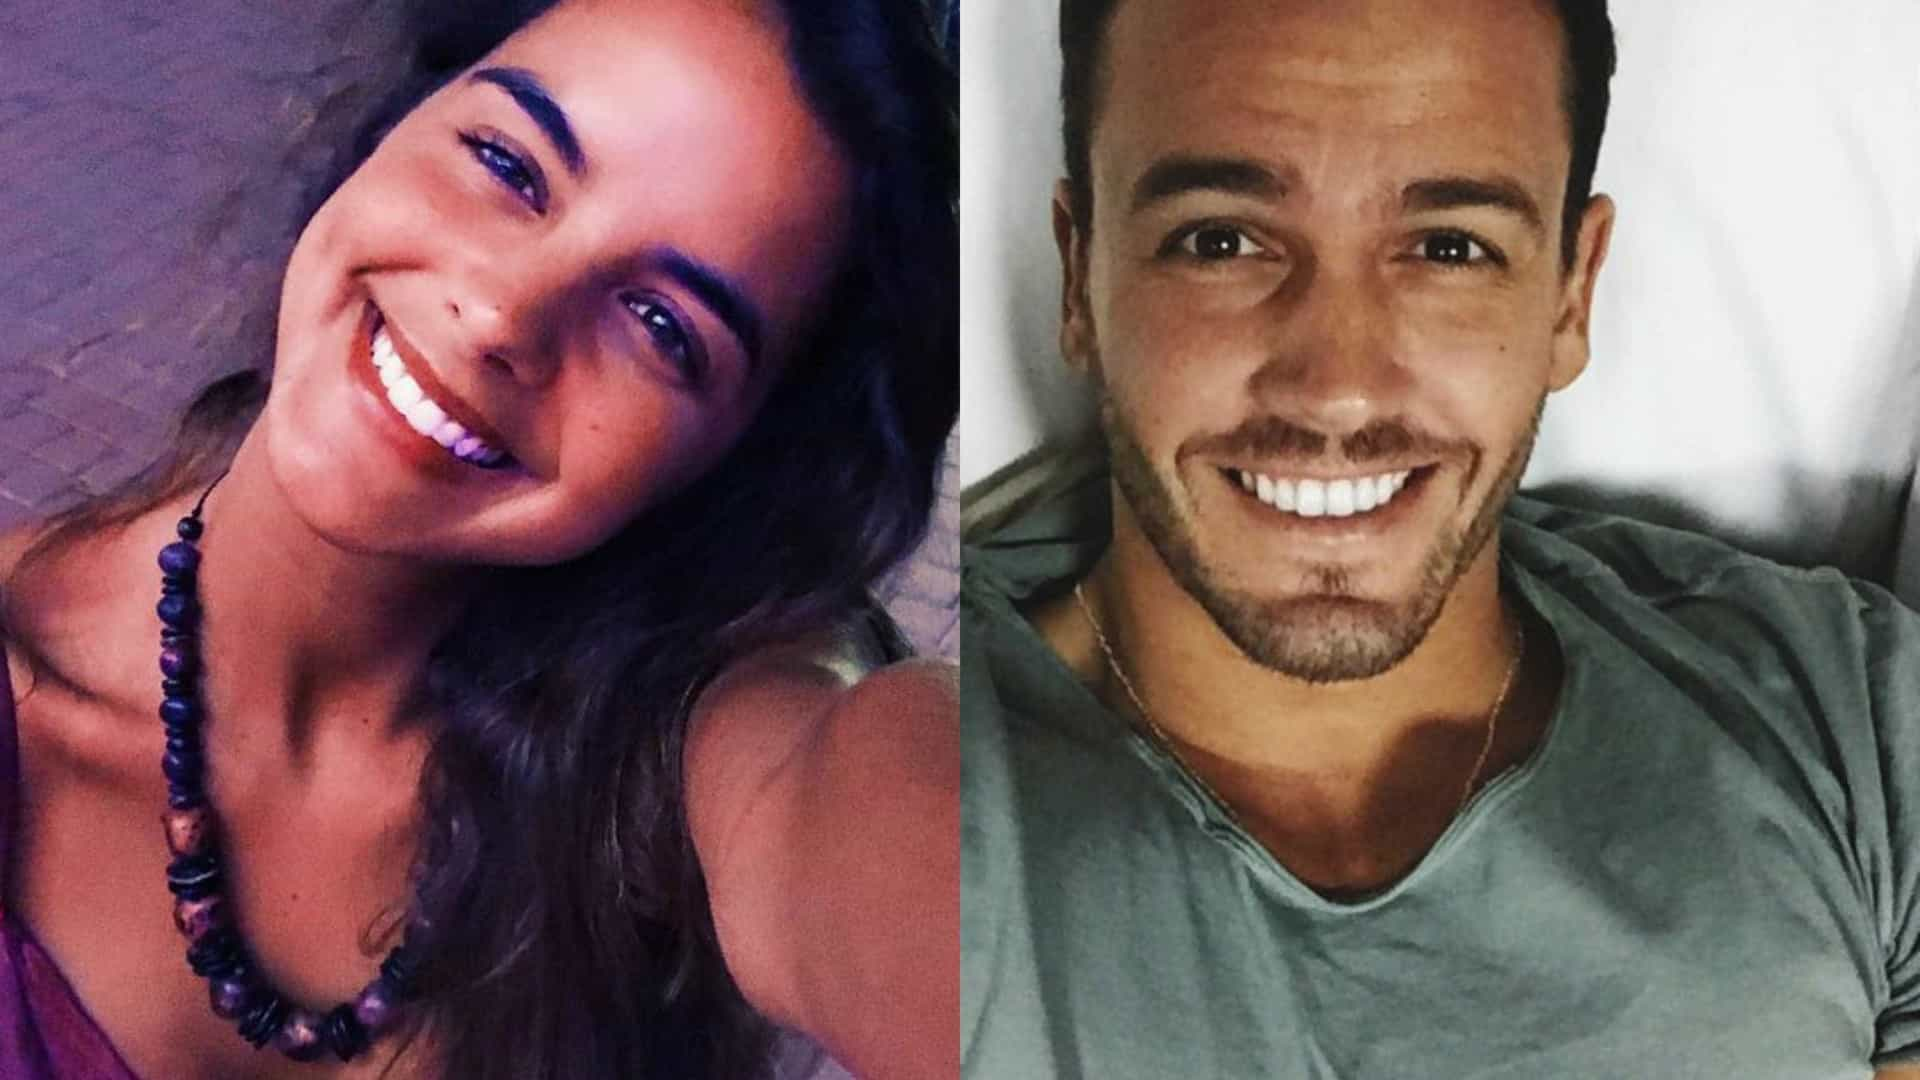 Sara Matos elogia Pedro Teixeira nas redes sociais